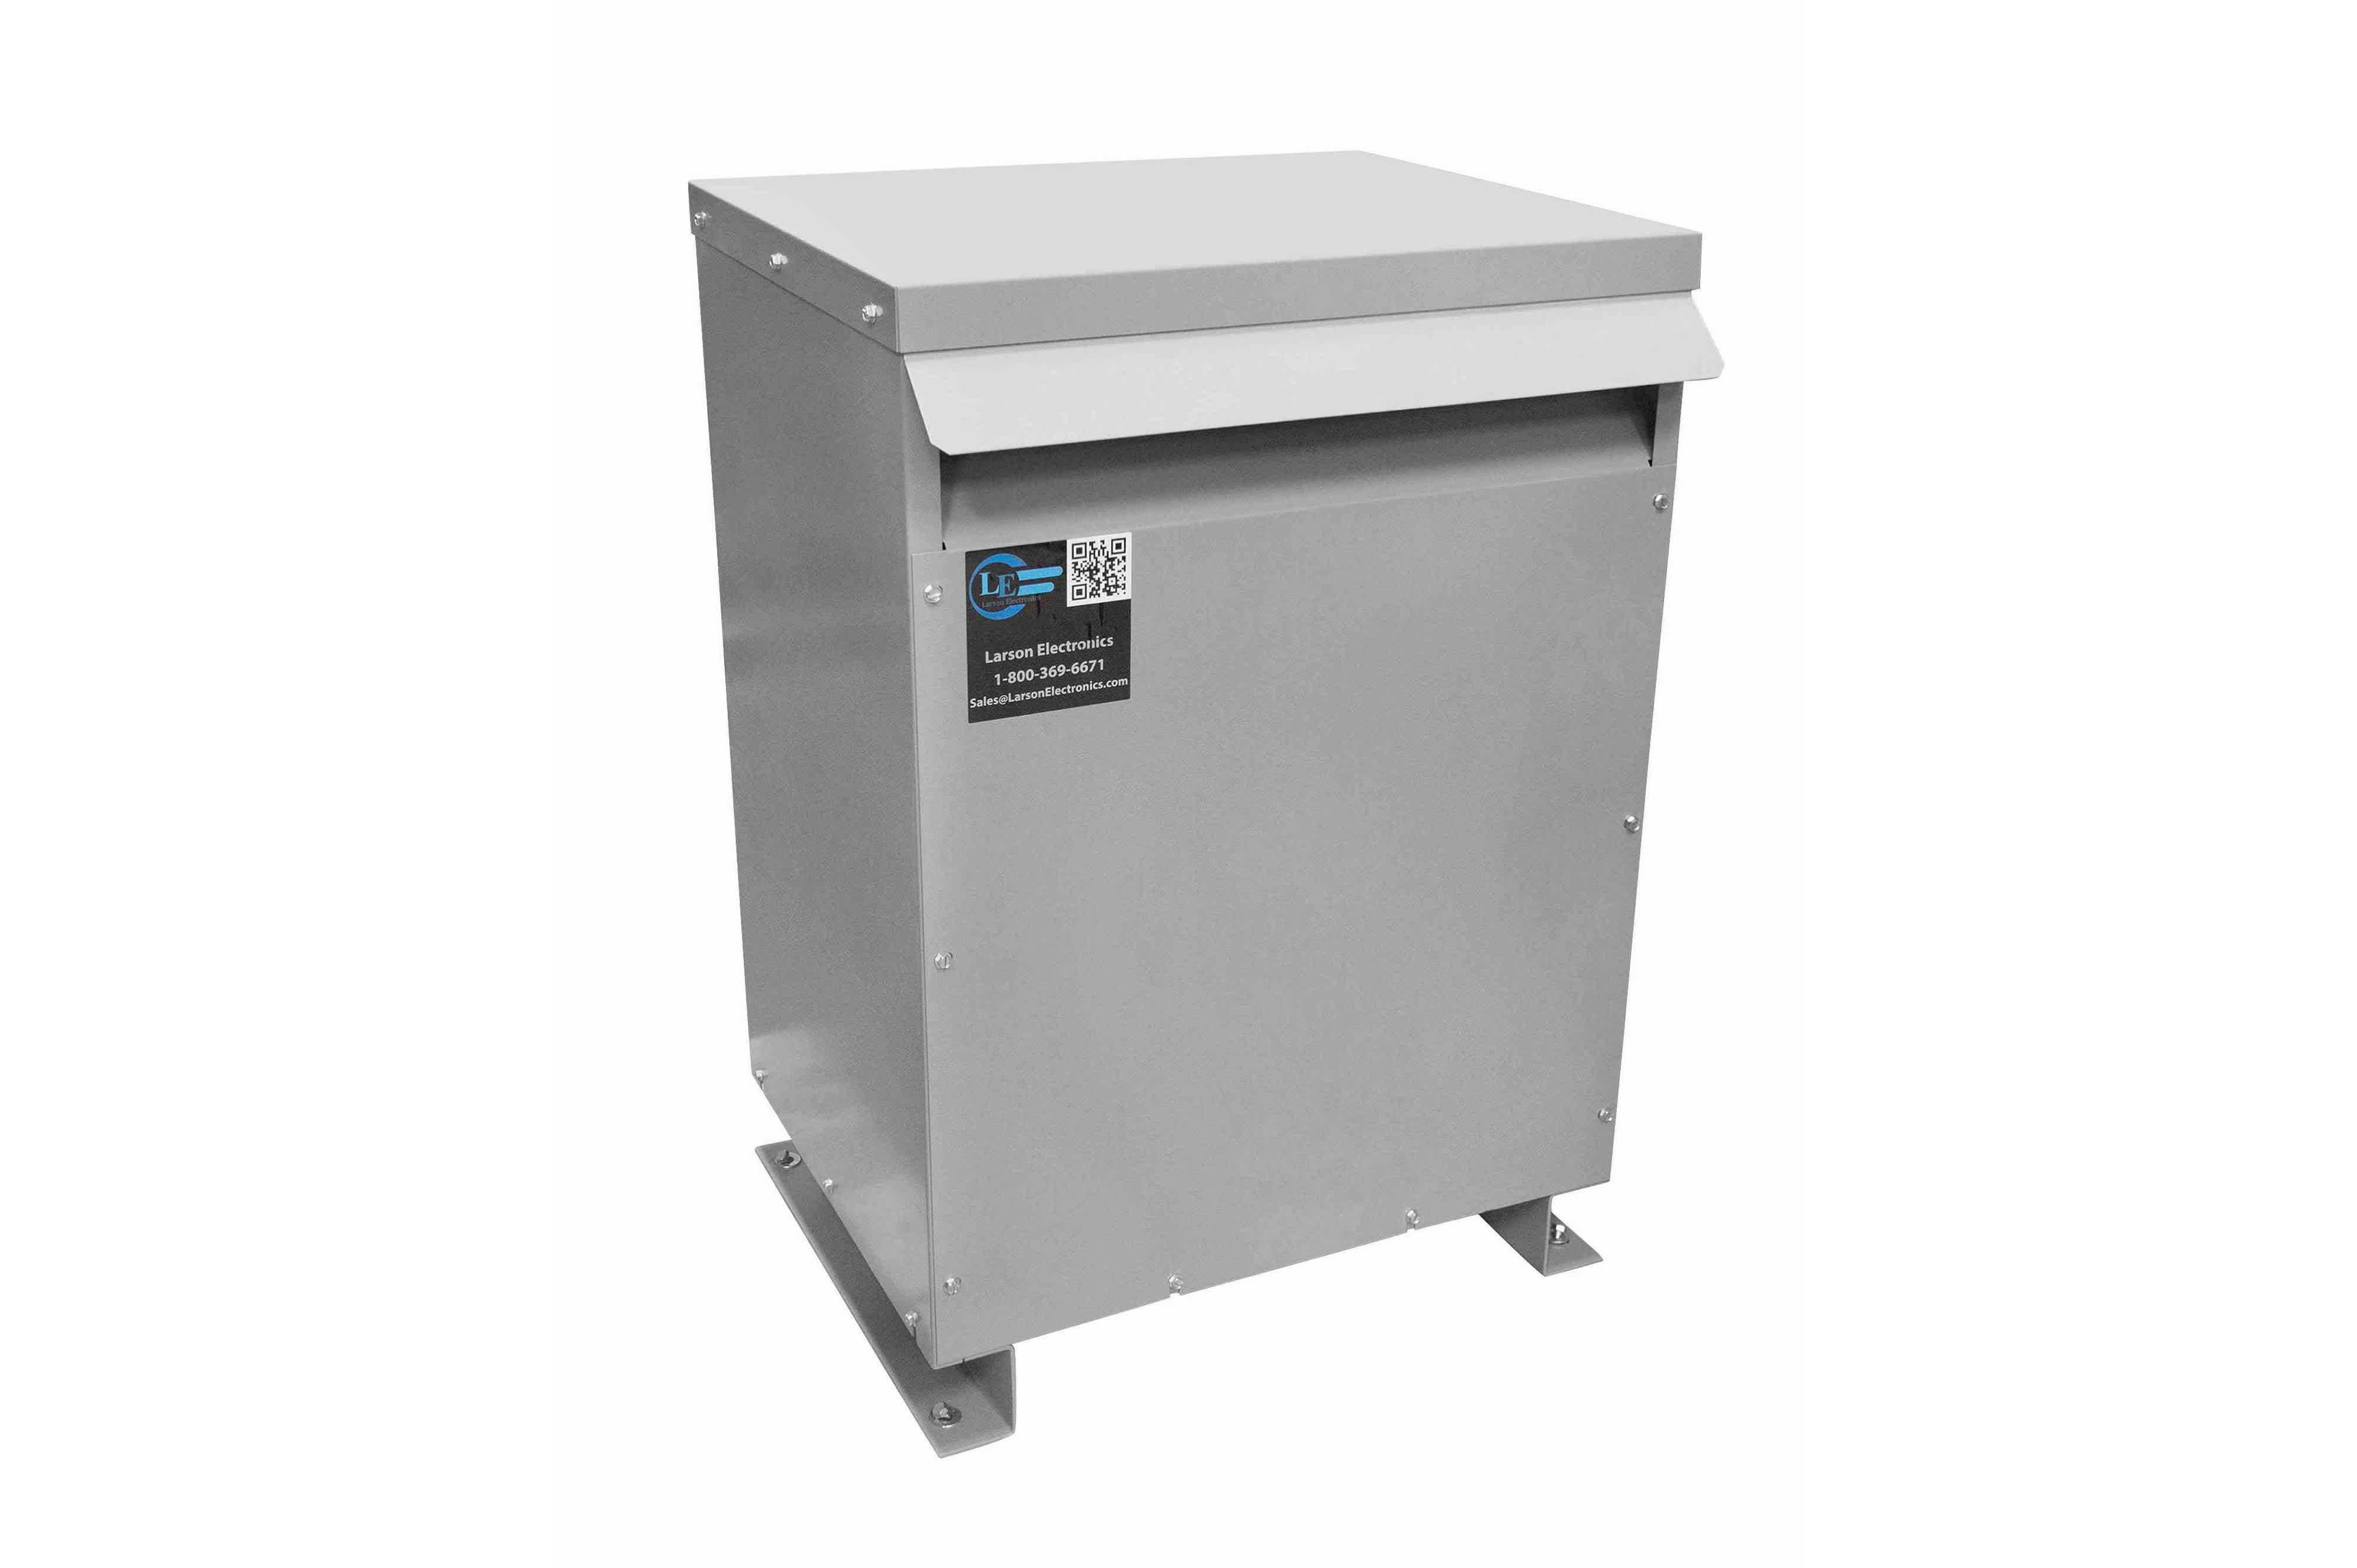 20 kVA 3PH Isolation Transformer, 600V Wye Primary, 208Y/120 Wye-N Secondary, N3R, Ventilated, 60 Hz